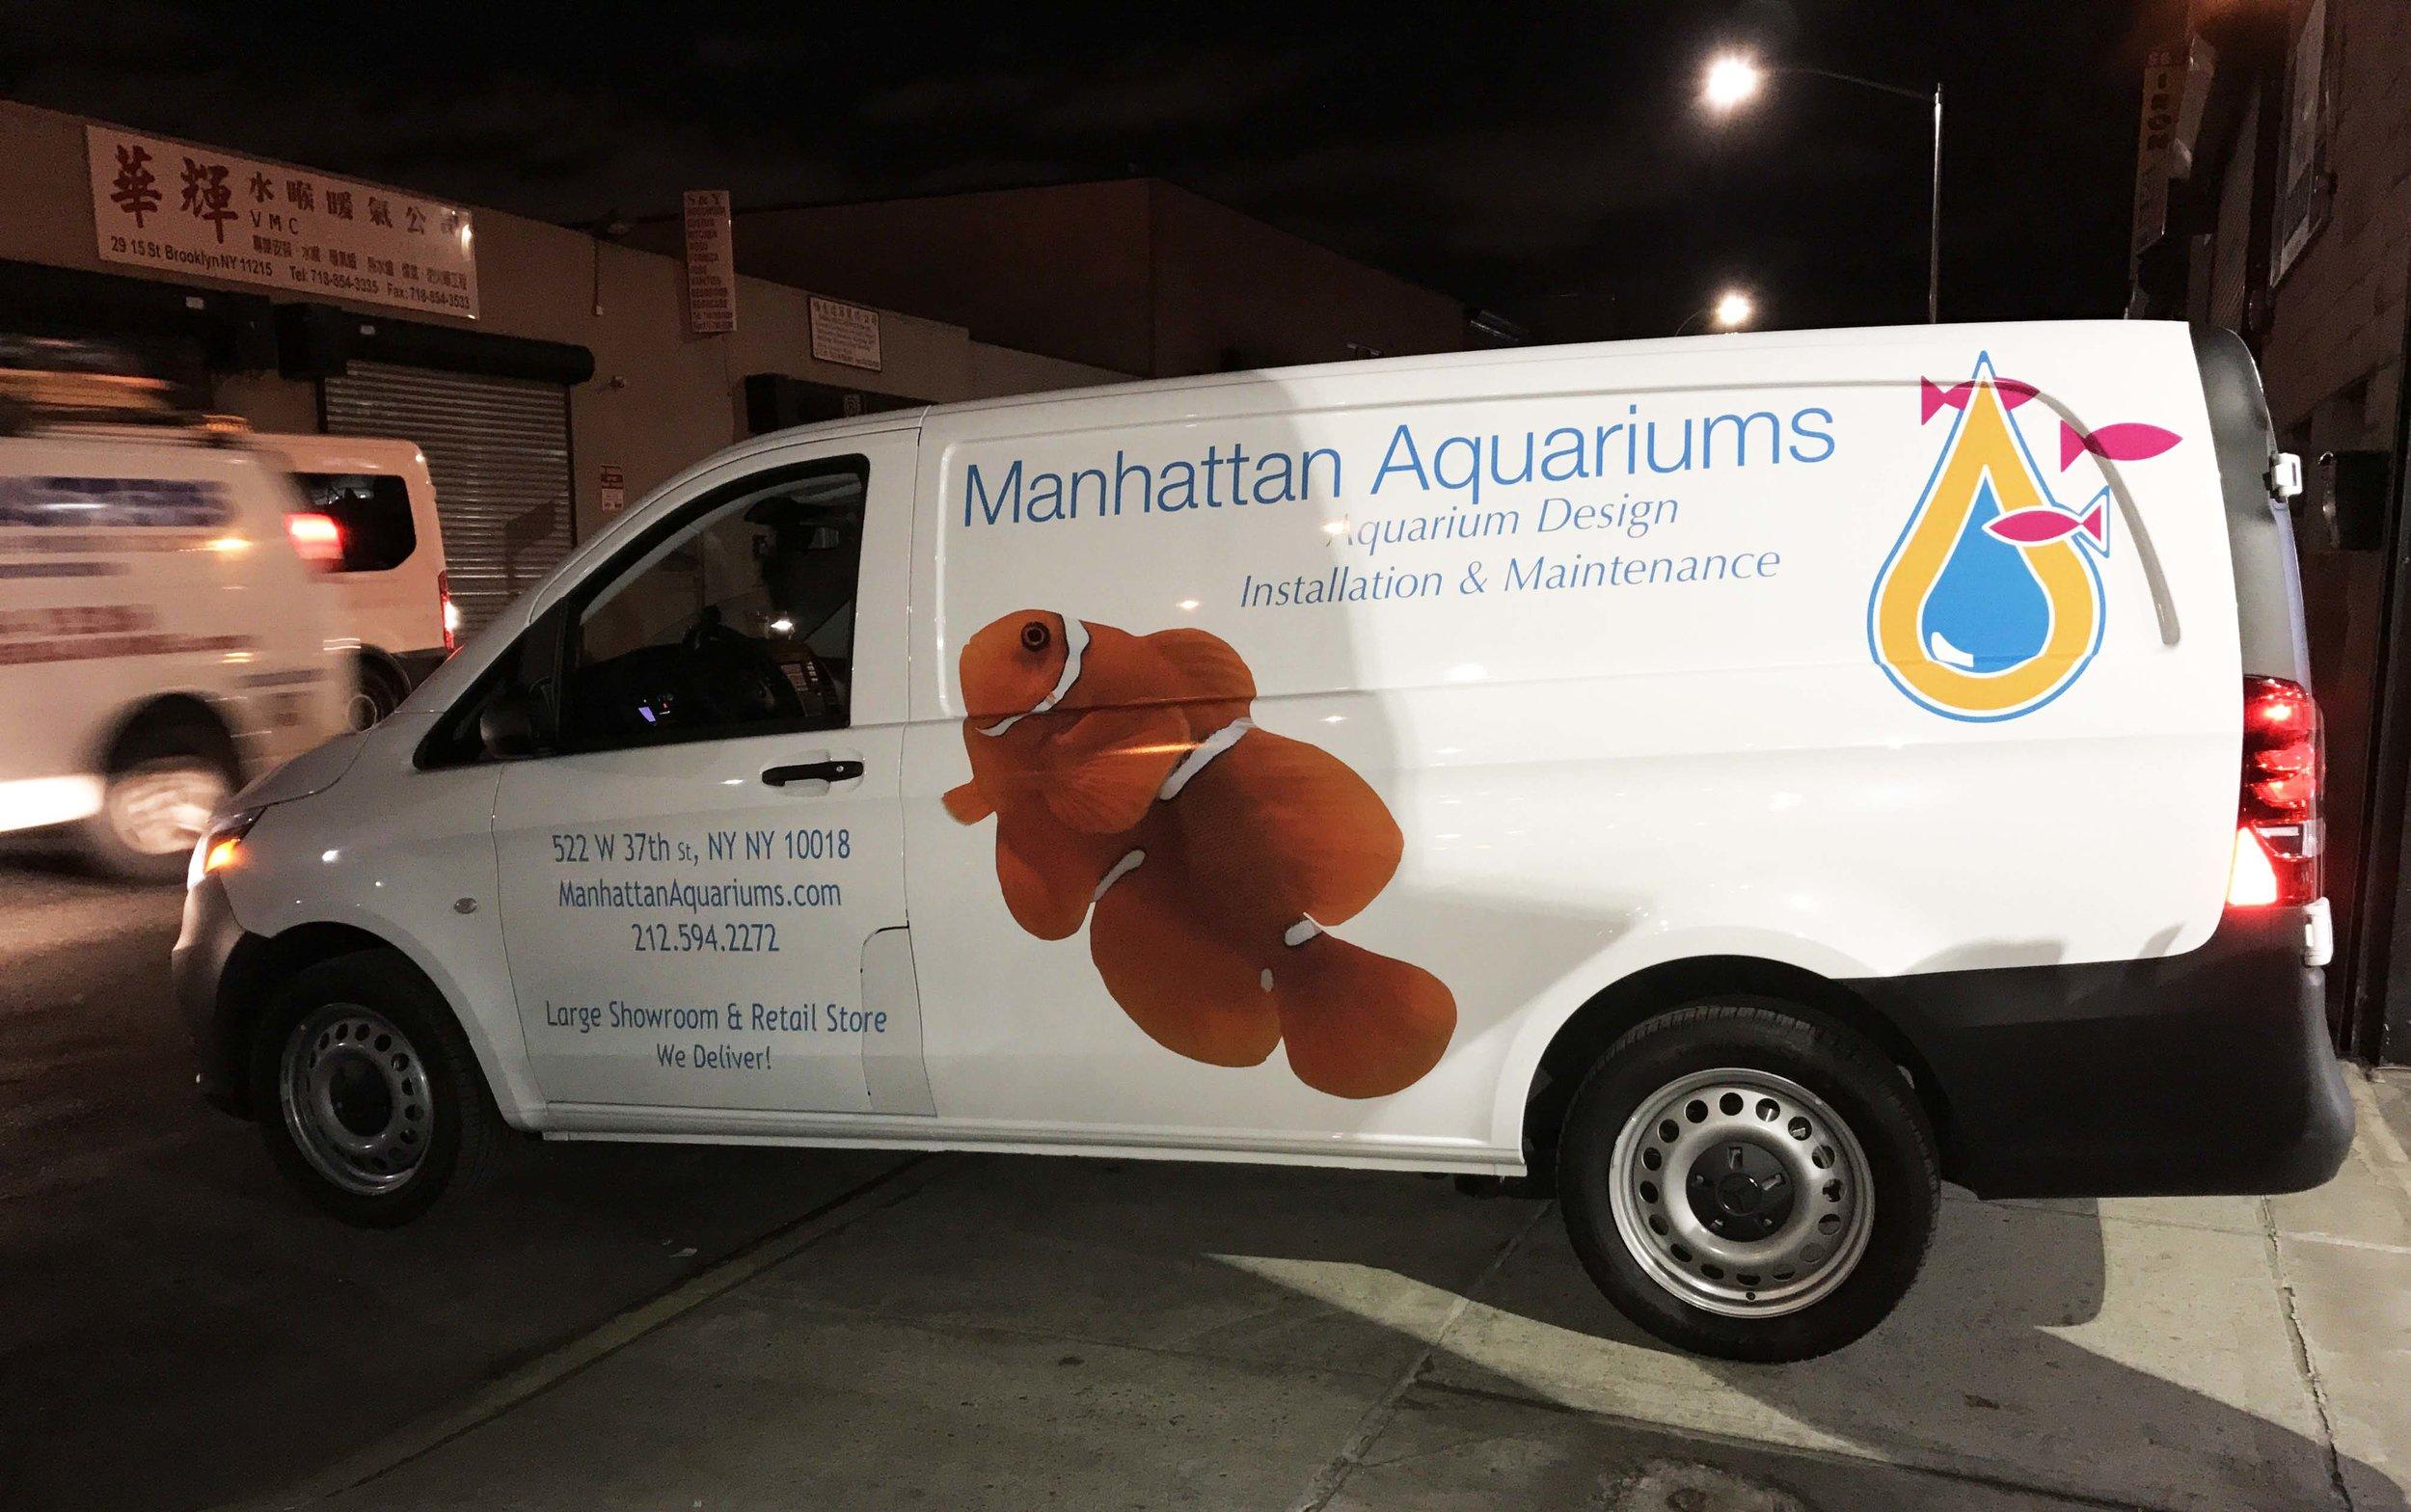 Manhattan Aquariums  522 W 37th Street  website